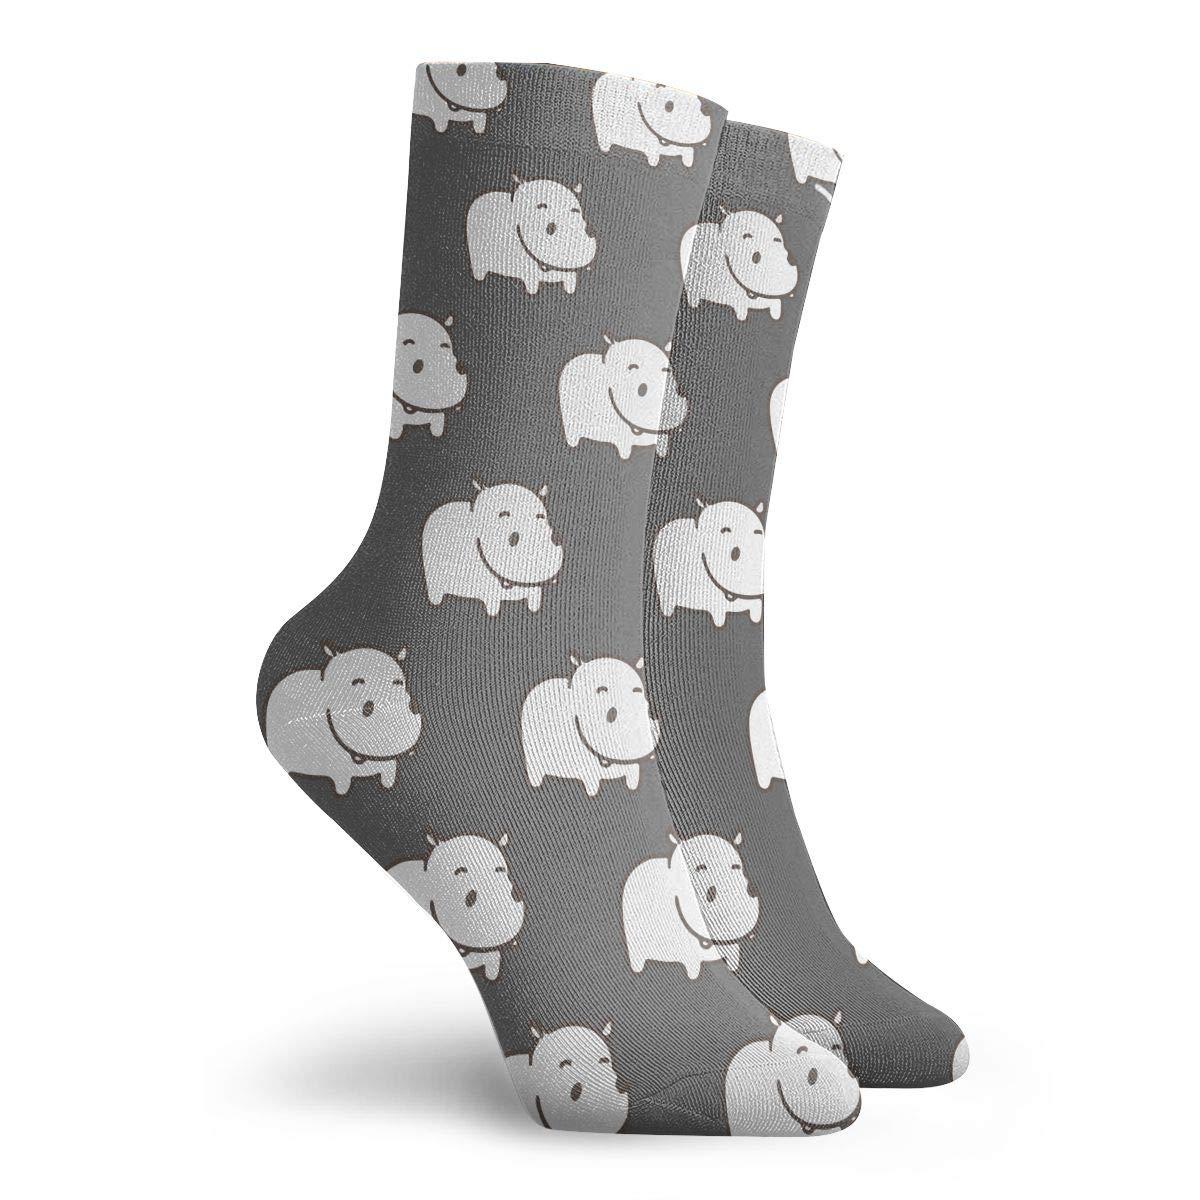 Baby Hippo Unisex Funny Casual Crew Socks Athletic Socks For Boys Girls Kids Teenagers